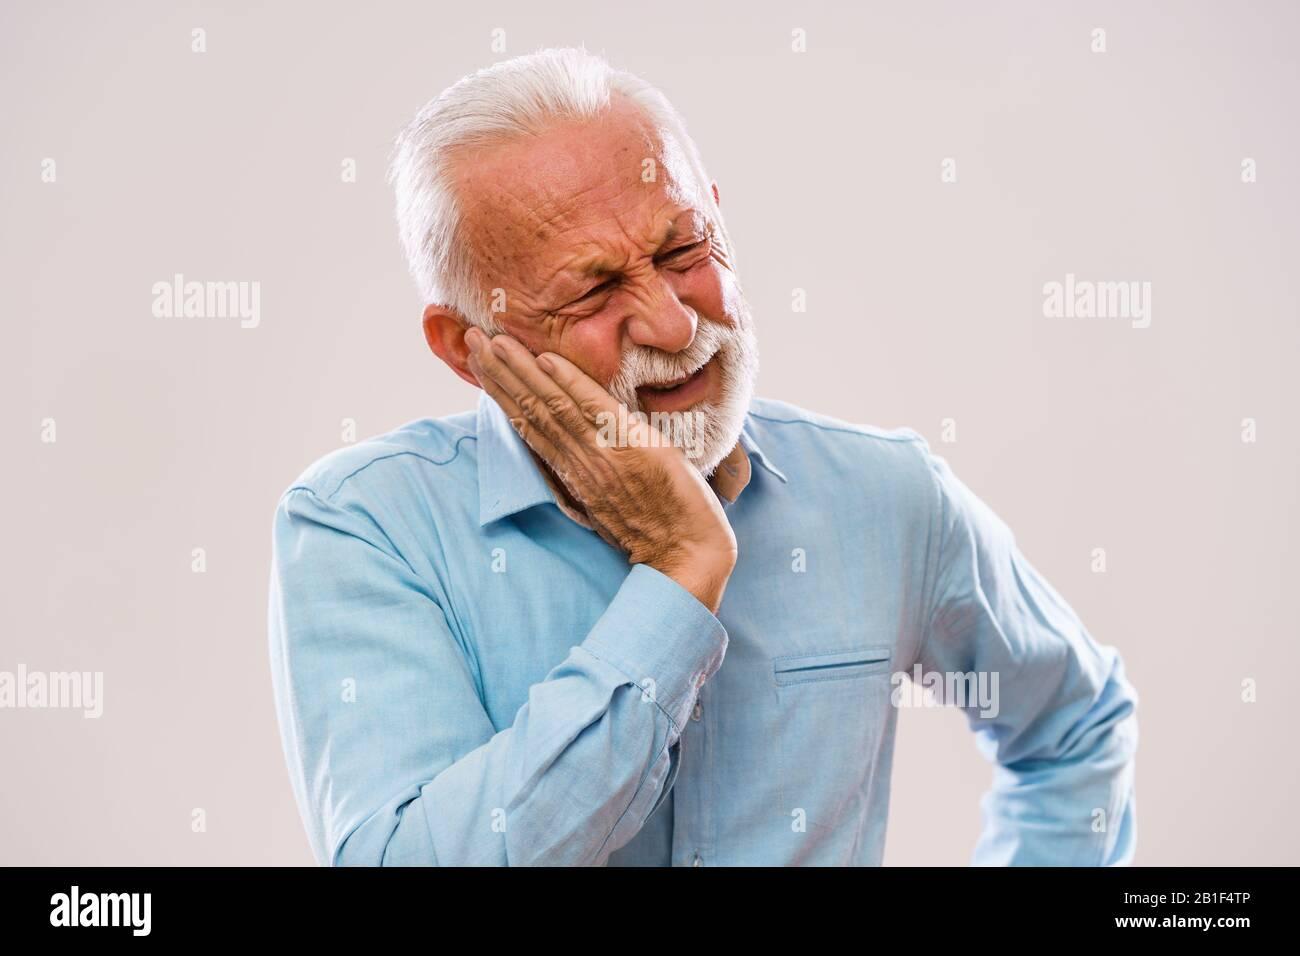 Portrait of senior man who is having toothache. Stock Photo